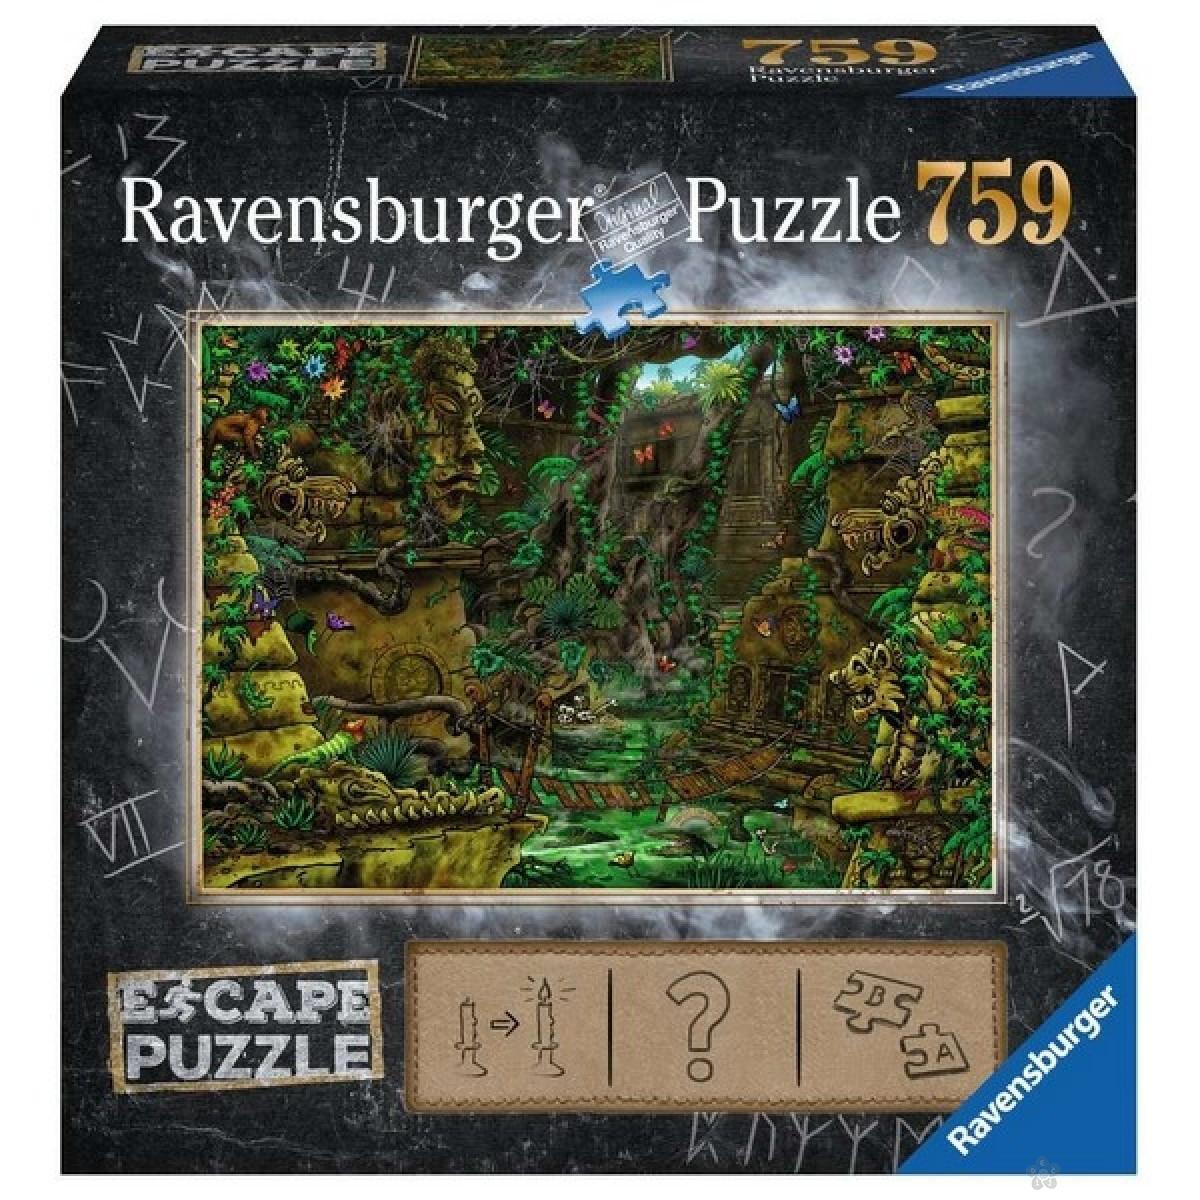 Ravensburger puzzle (slagalice) - Drevni hram  759 delova